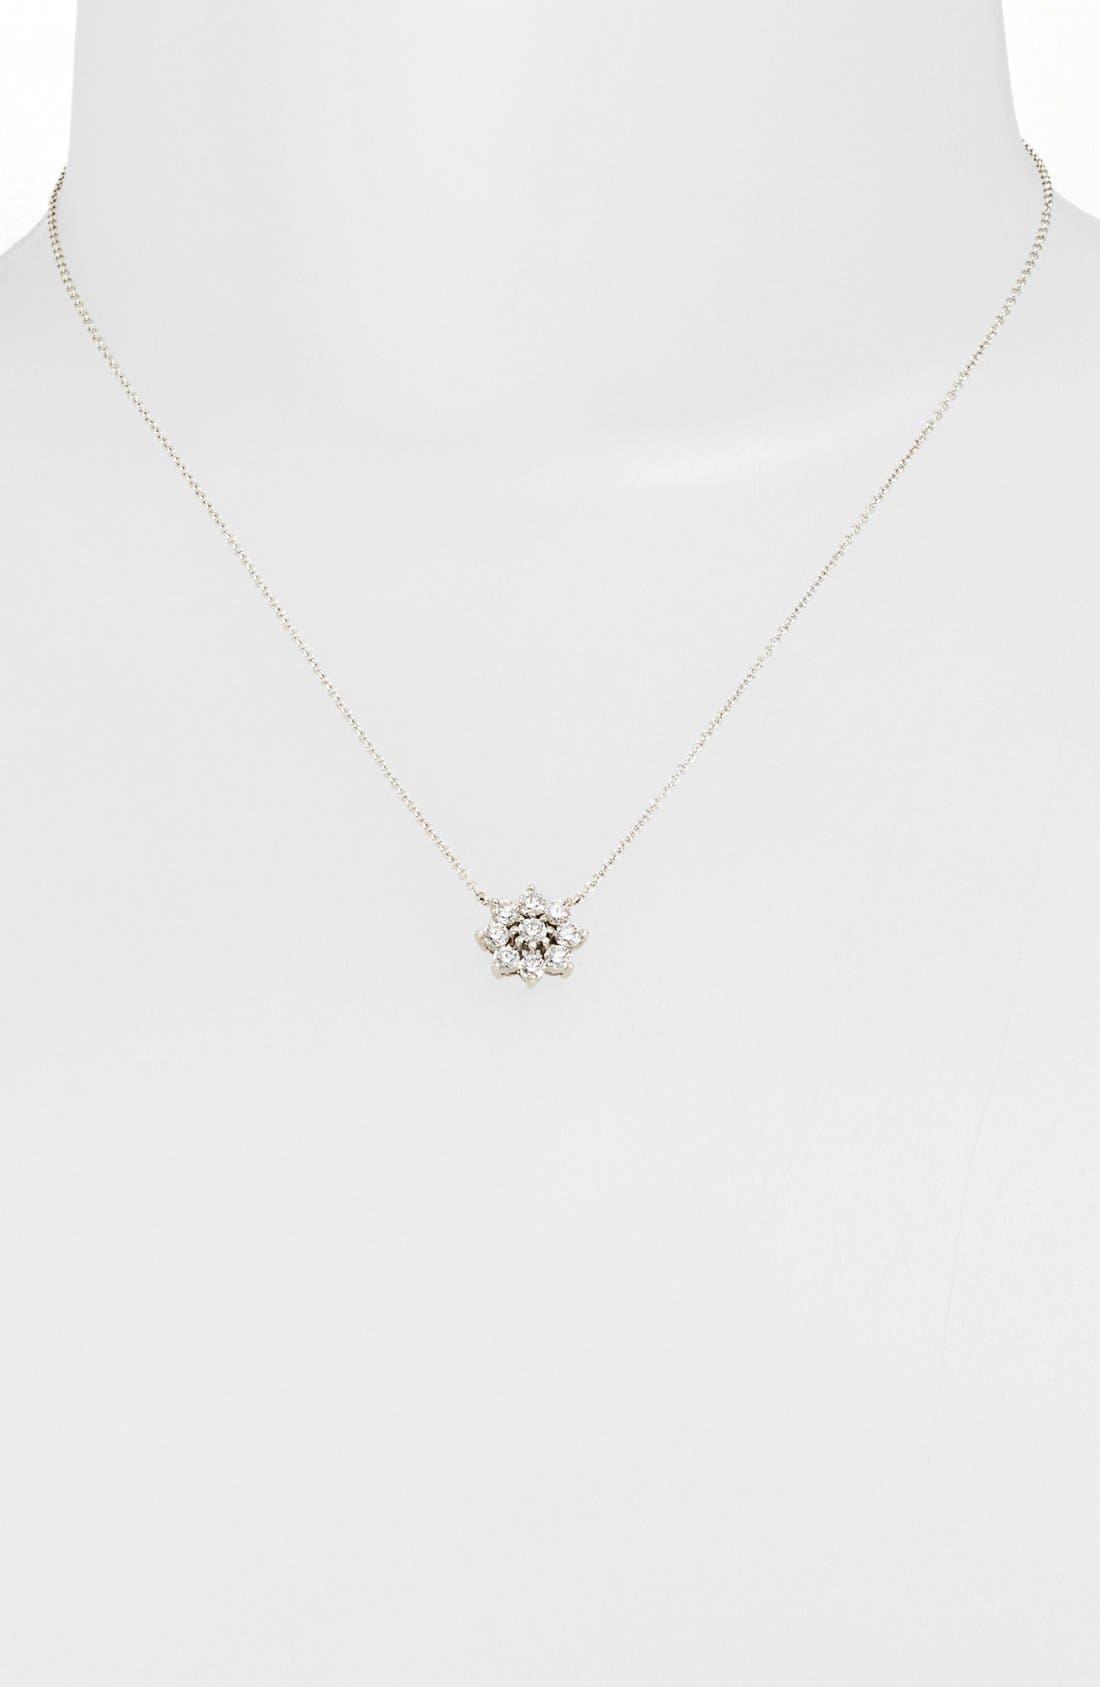 Main Image - Kwiat 'Blooms' Diamond Pendant Necklace